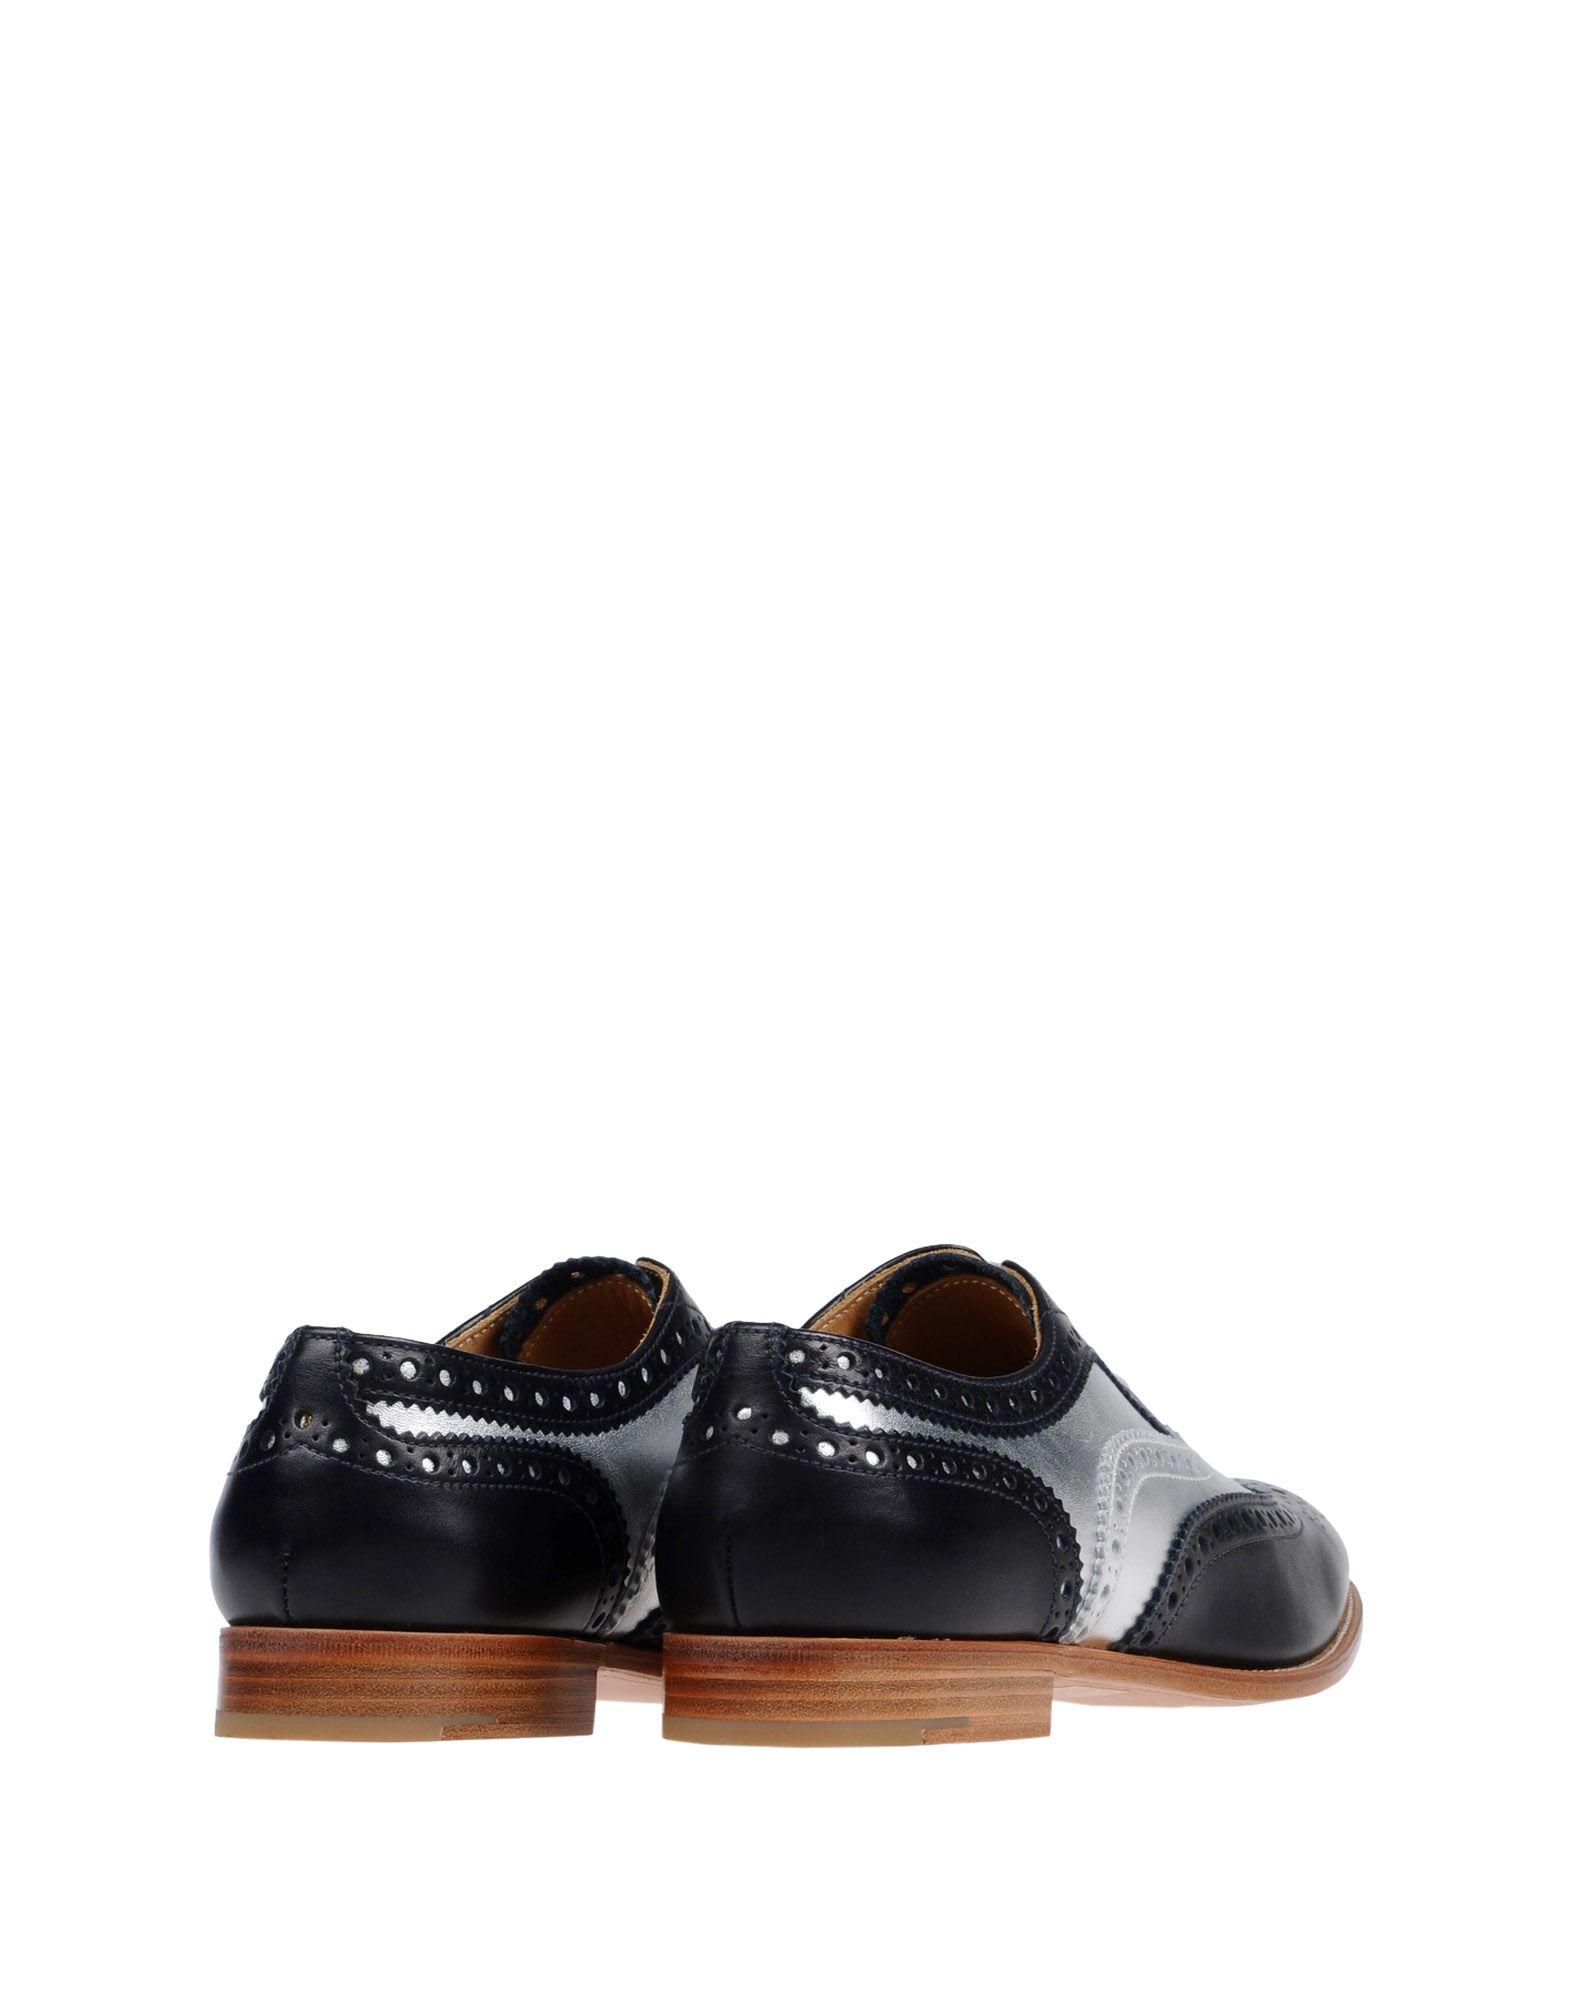 Chaussures - Tribunaux Marras Antonio atSEnf78